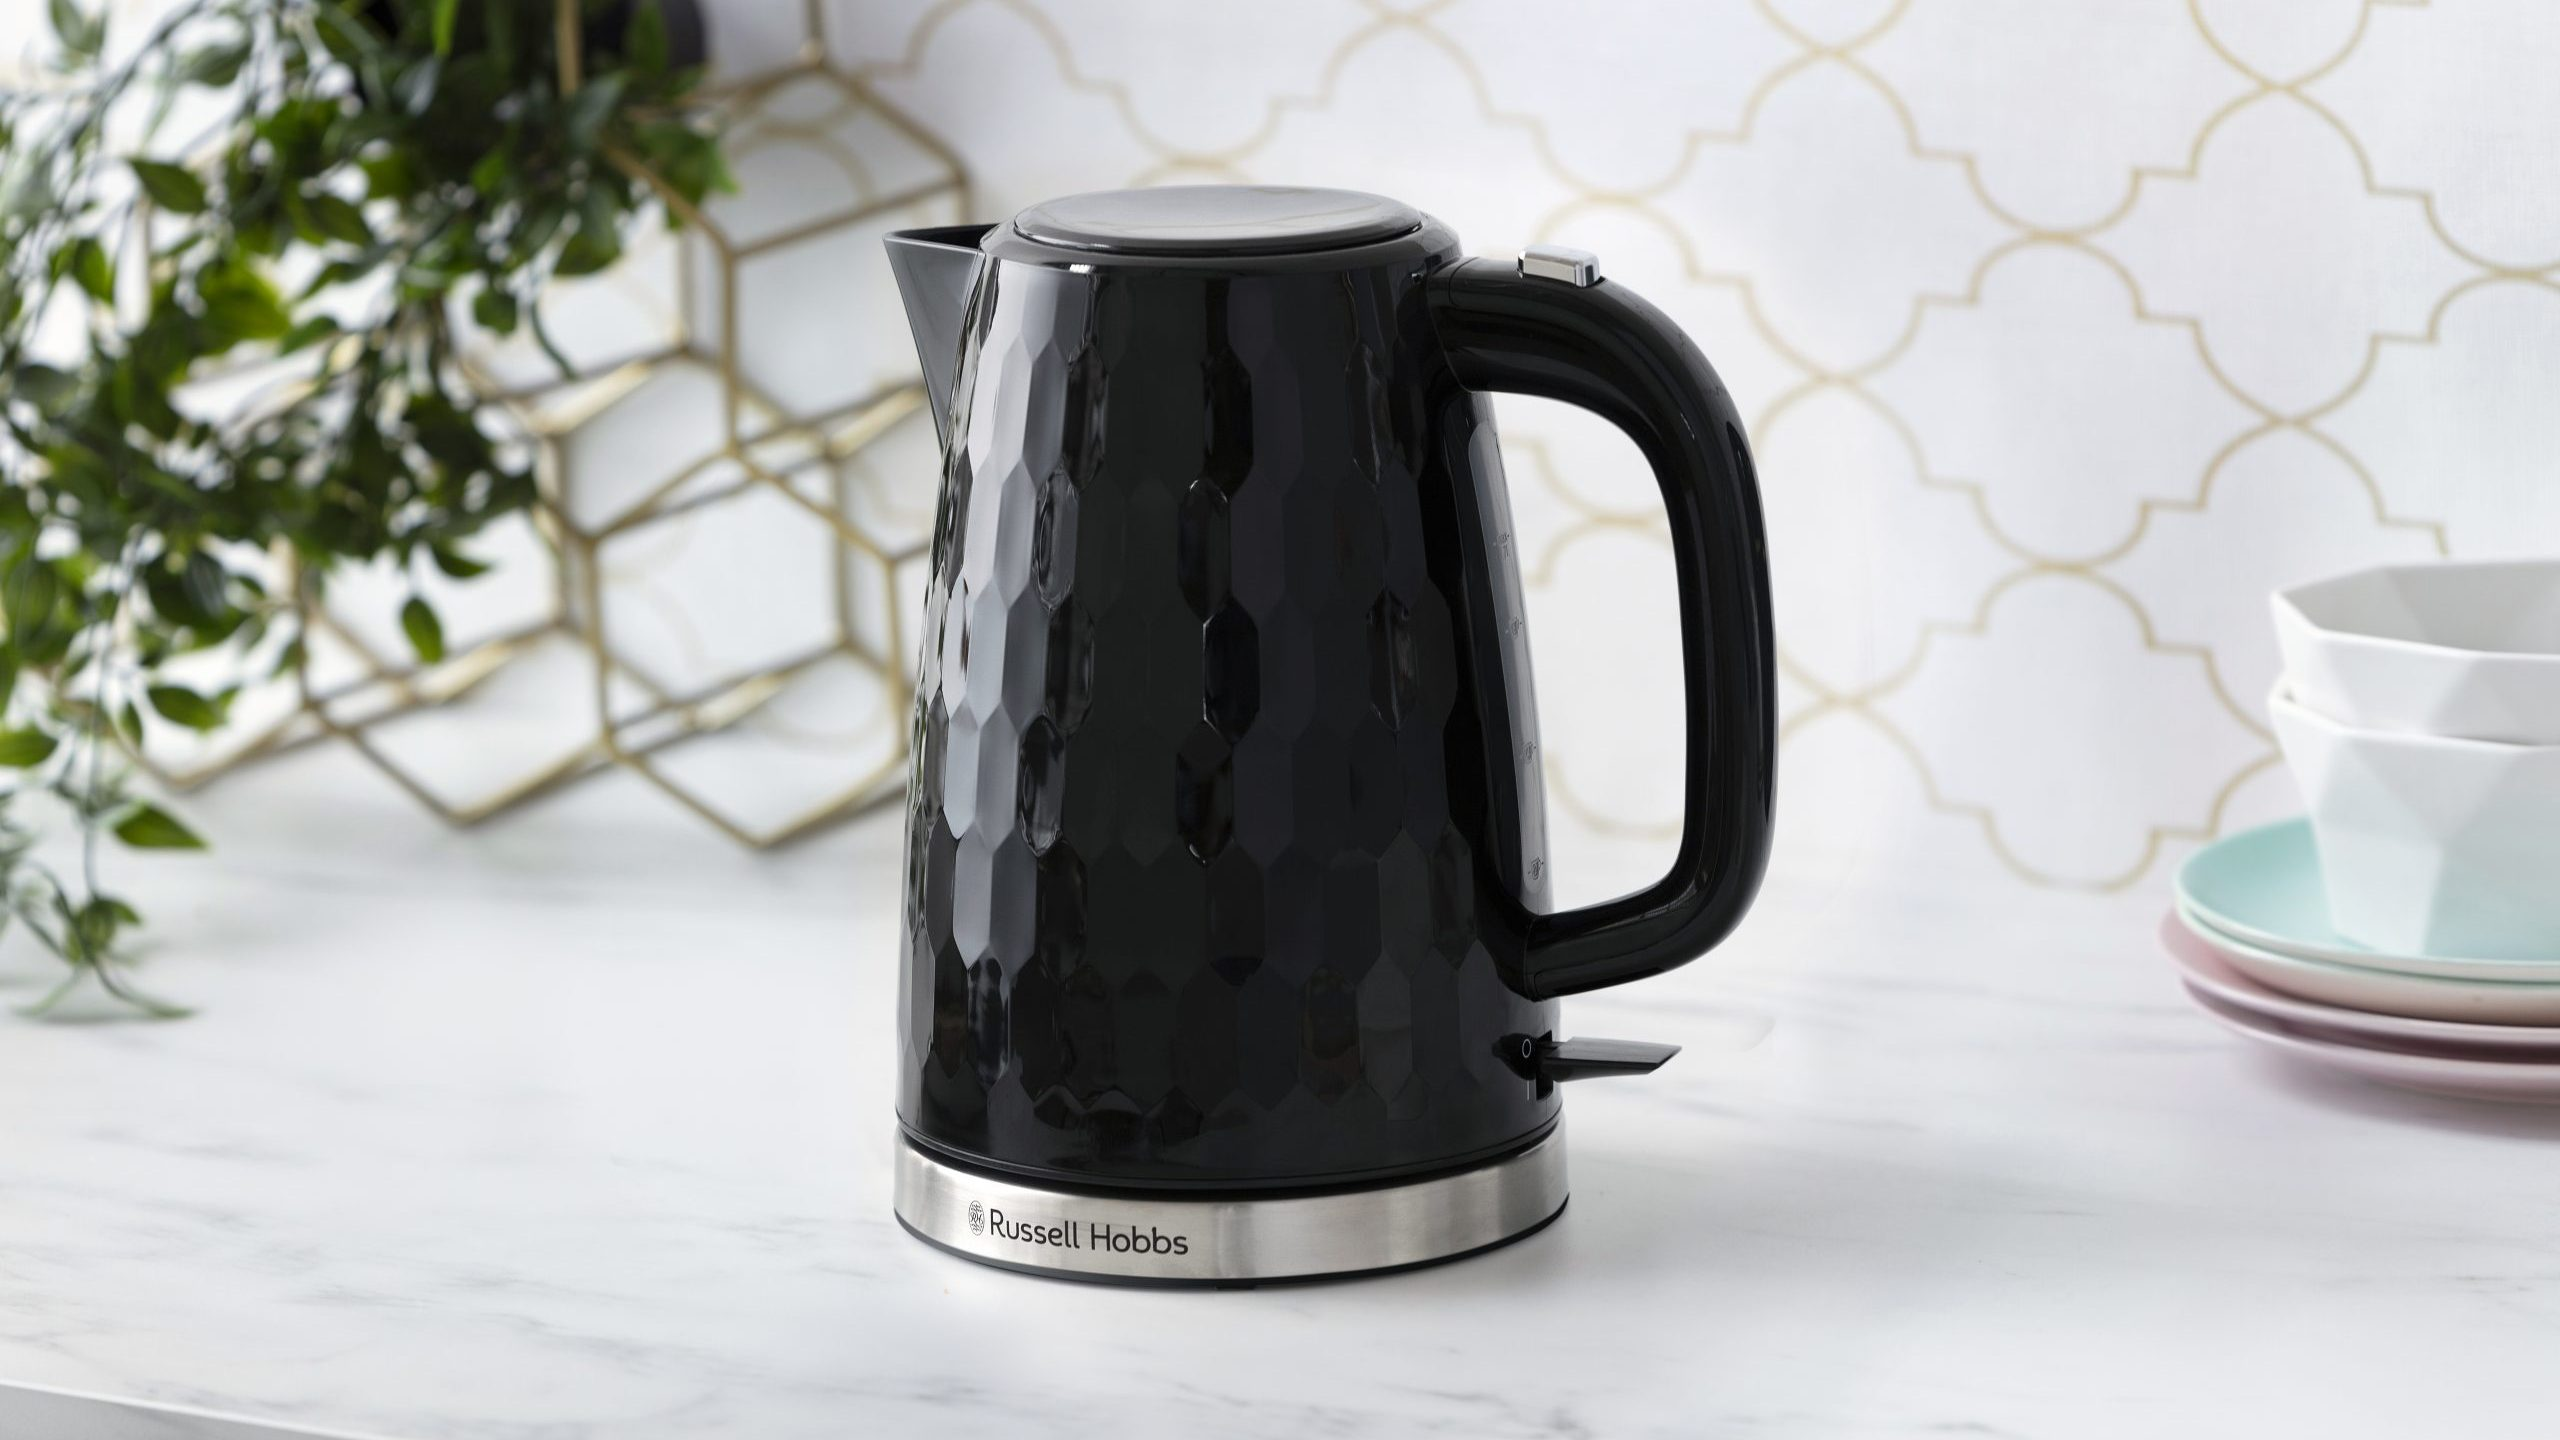 Russell Hobbes Honeycomb Wasserkocher in schwarz. Foto: Russell Hobbes